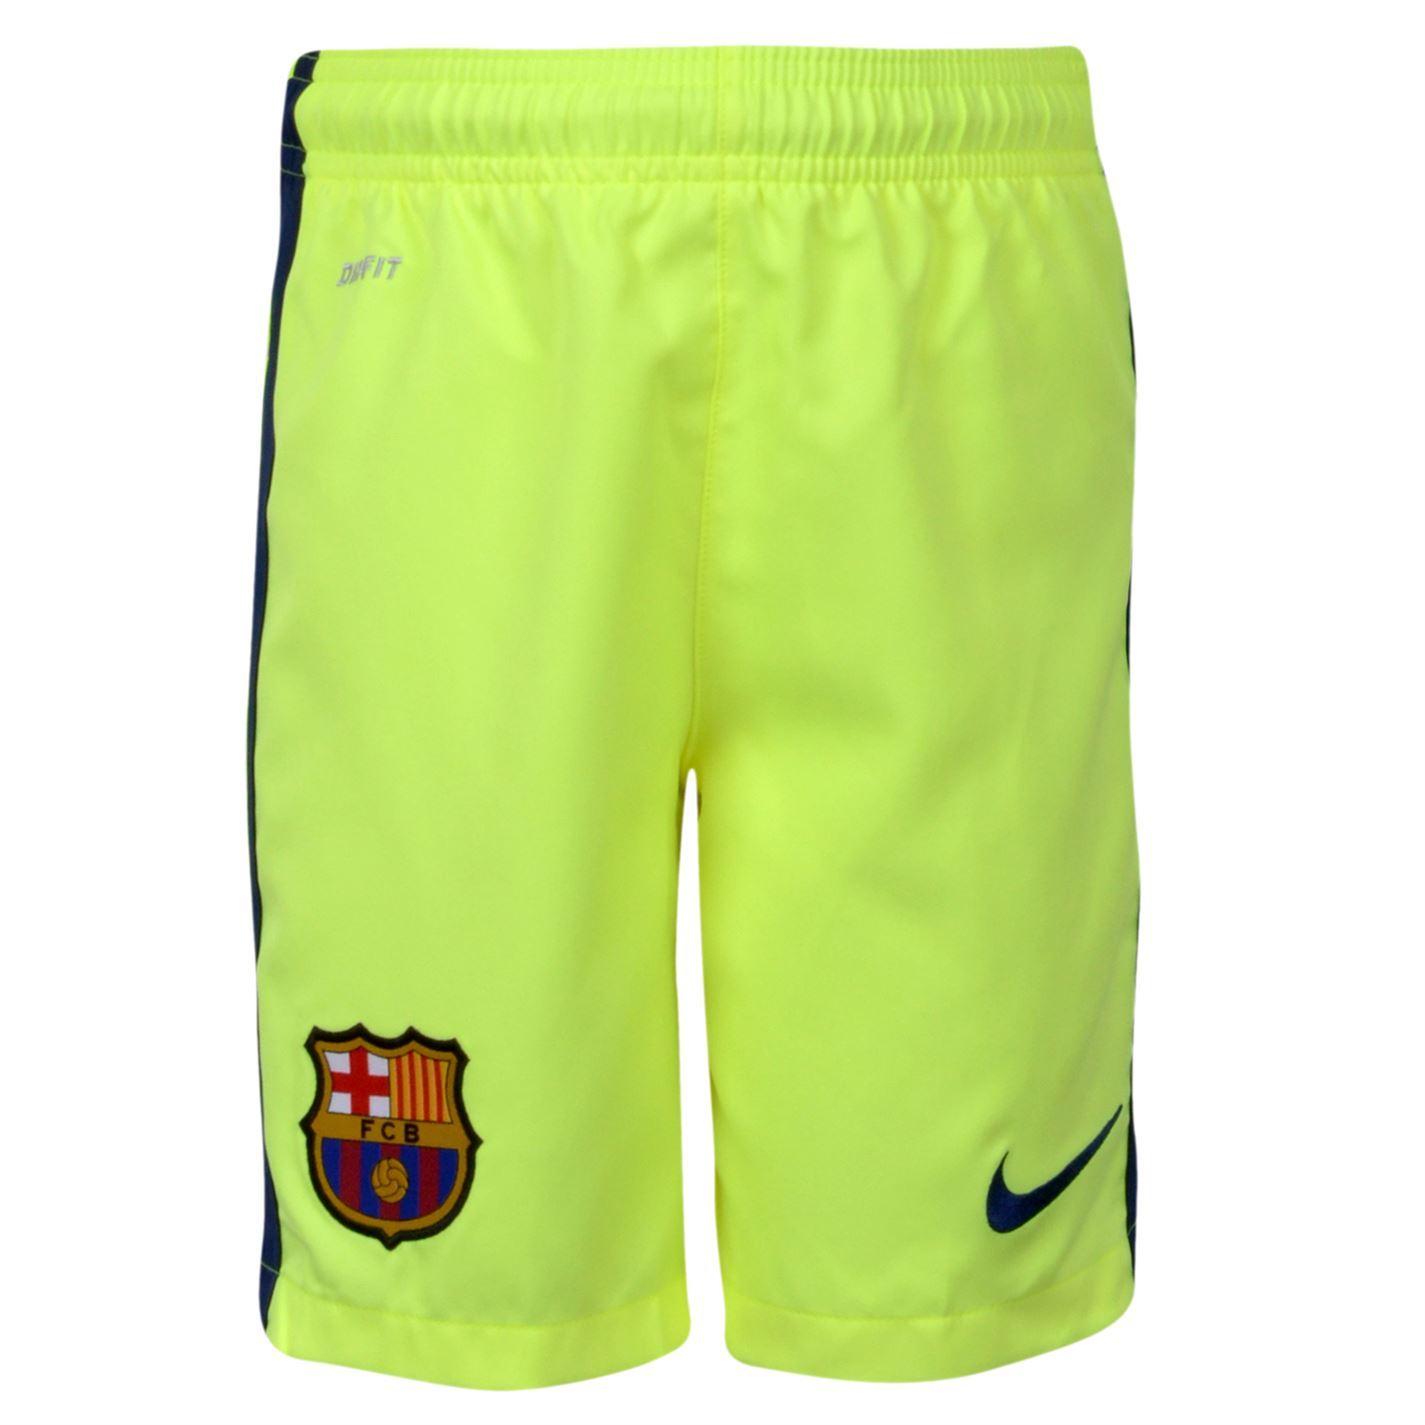 ... Nike Barcelona 3rd Shorts Juniors Mens Yellow Football Soccer Fan  Sportswear ... 36fda67b8d8